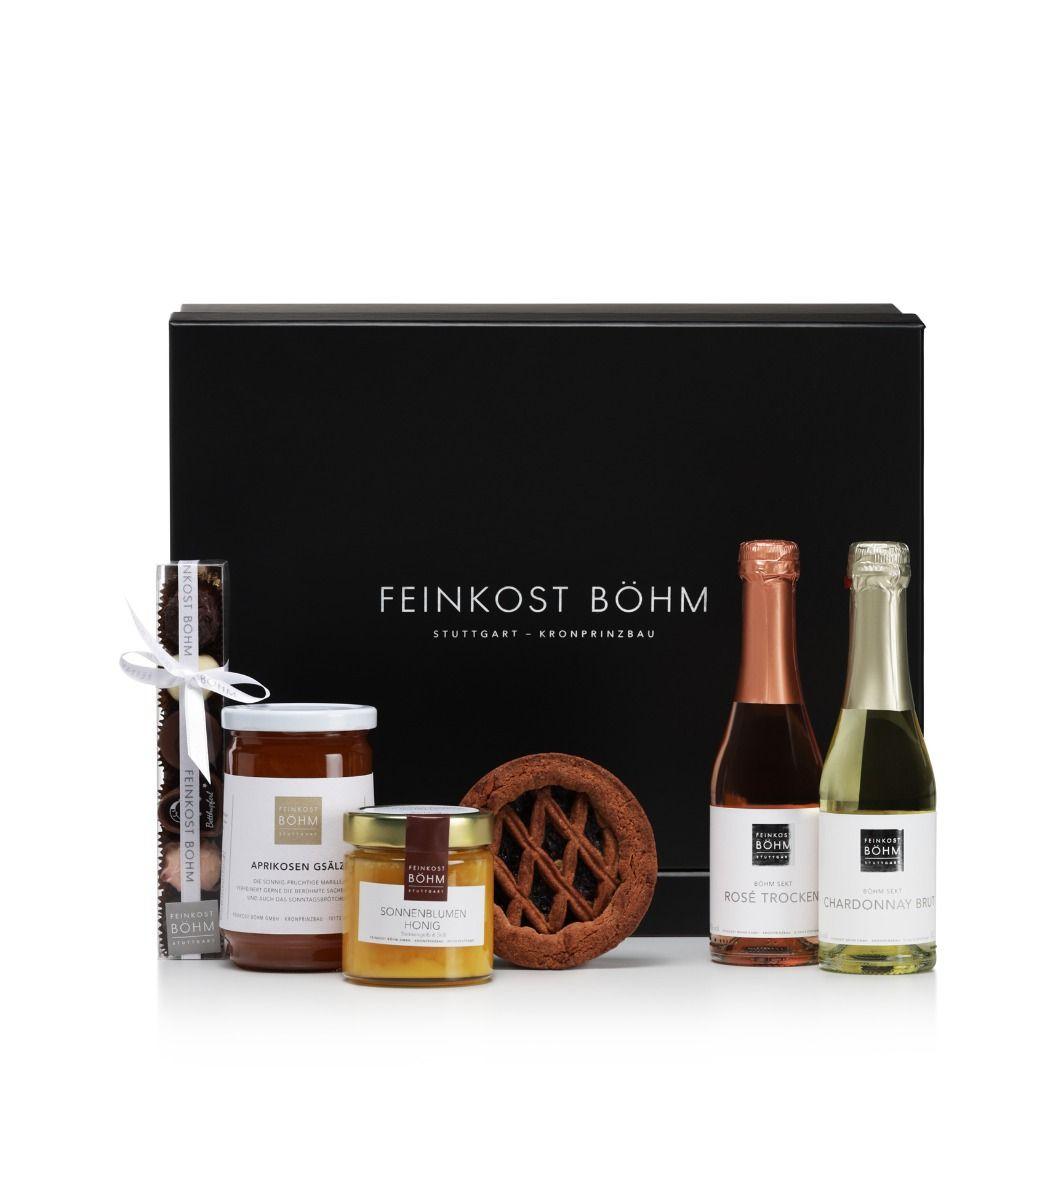 Feinkost Böhm's Süßer Feinschmeckergruß